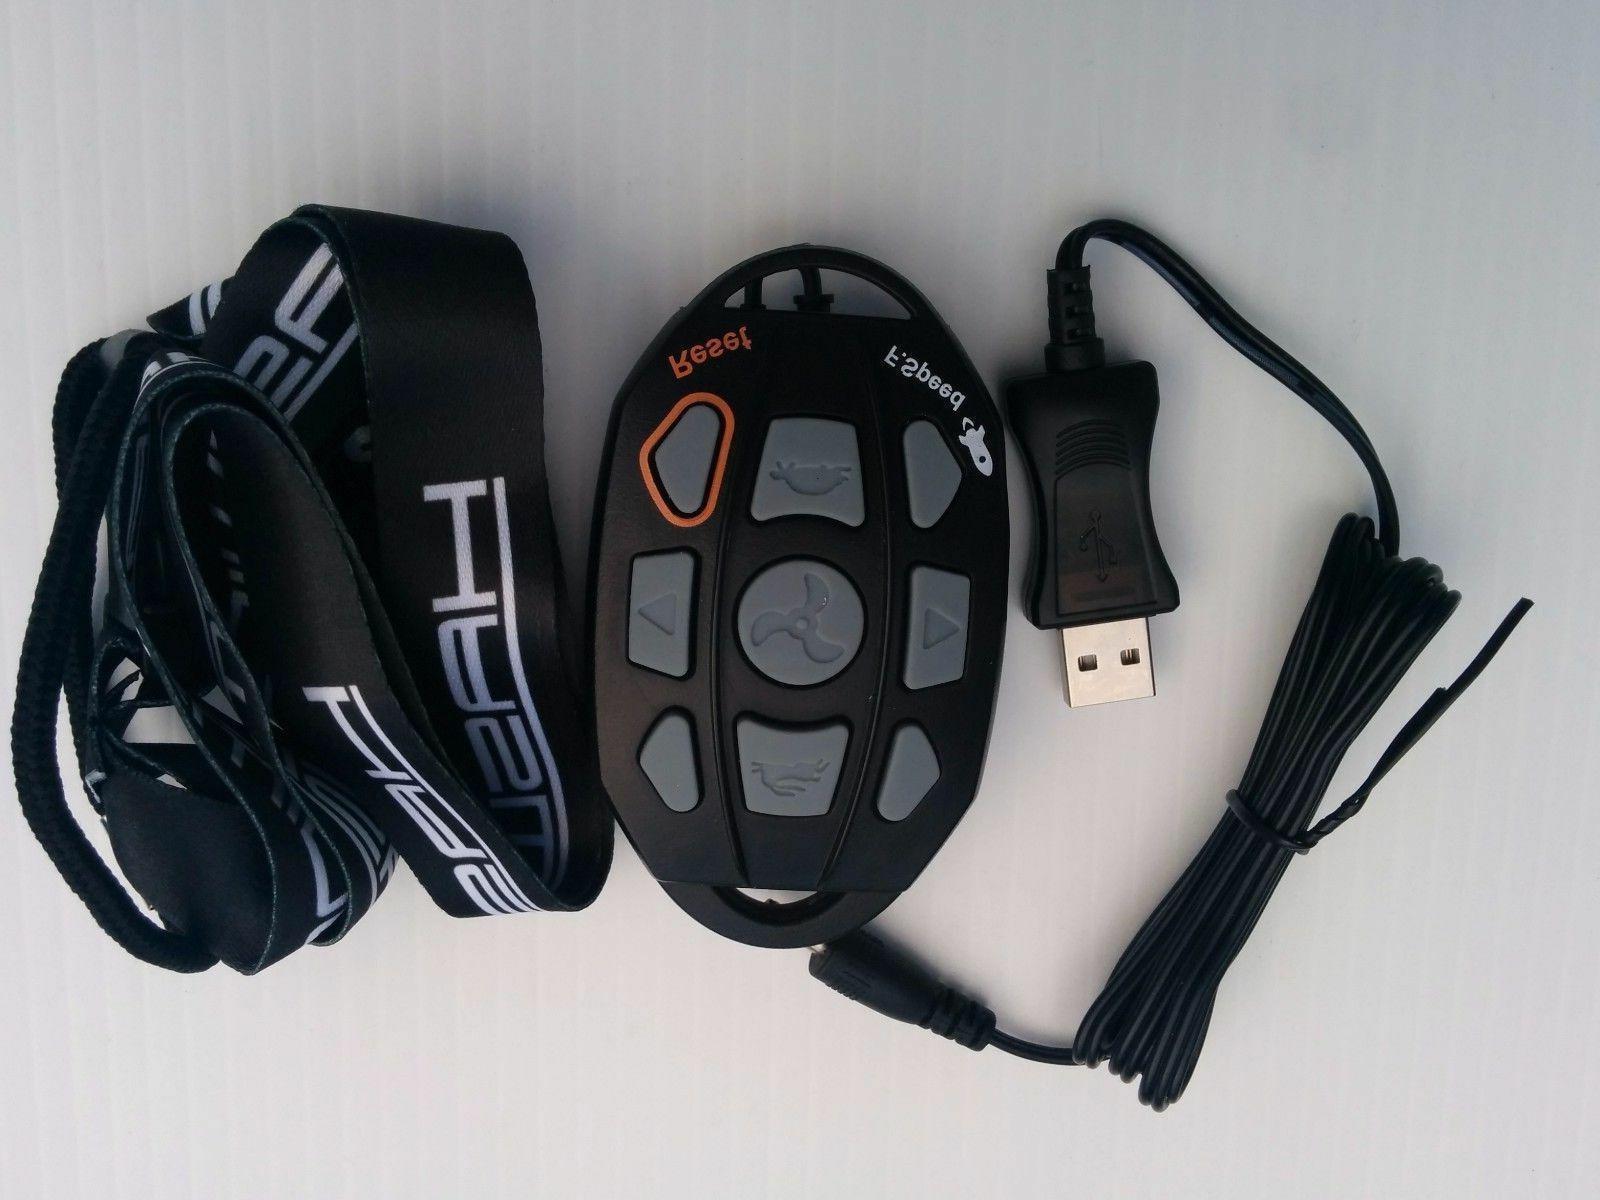 Haswing Wireless GPS 50736-120/137